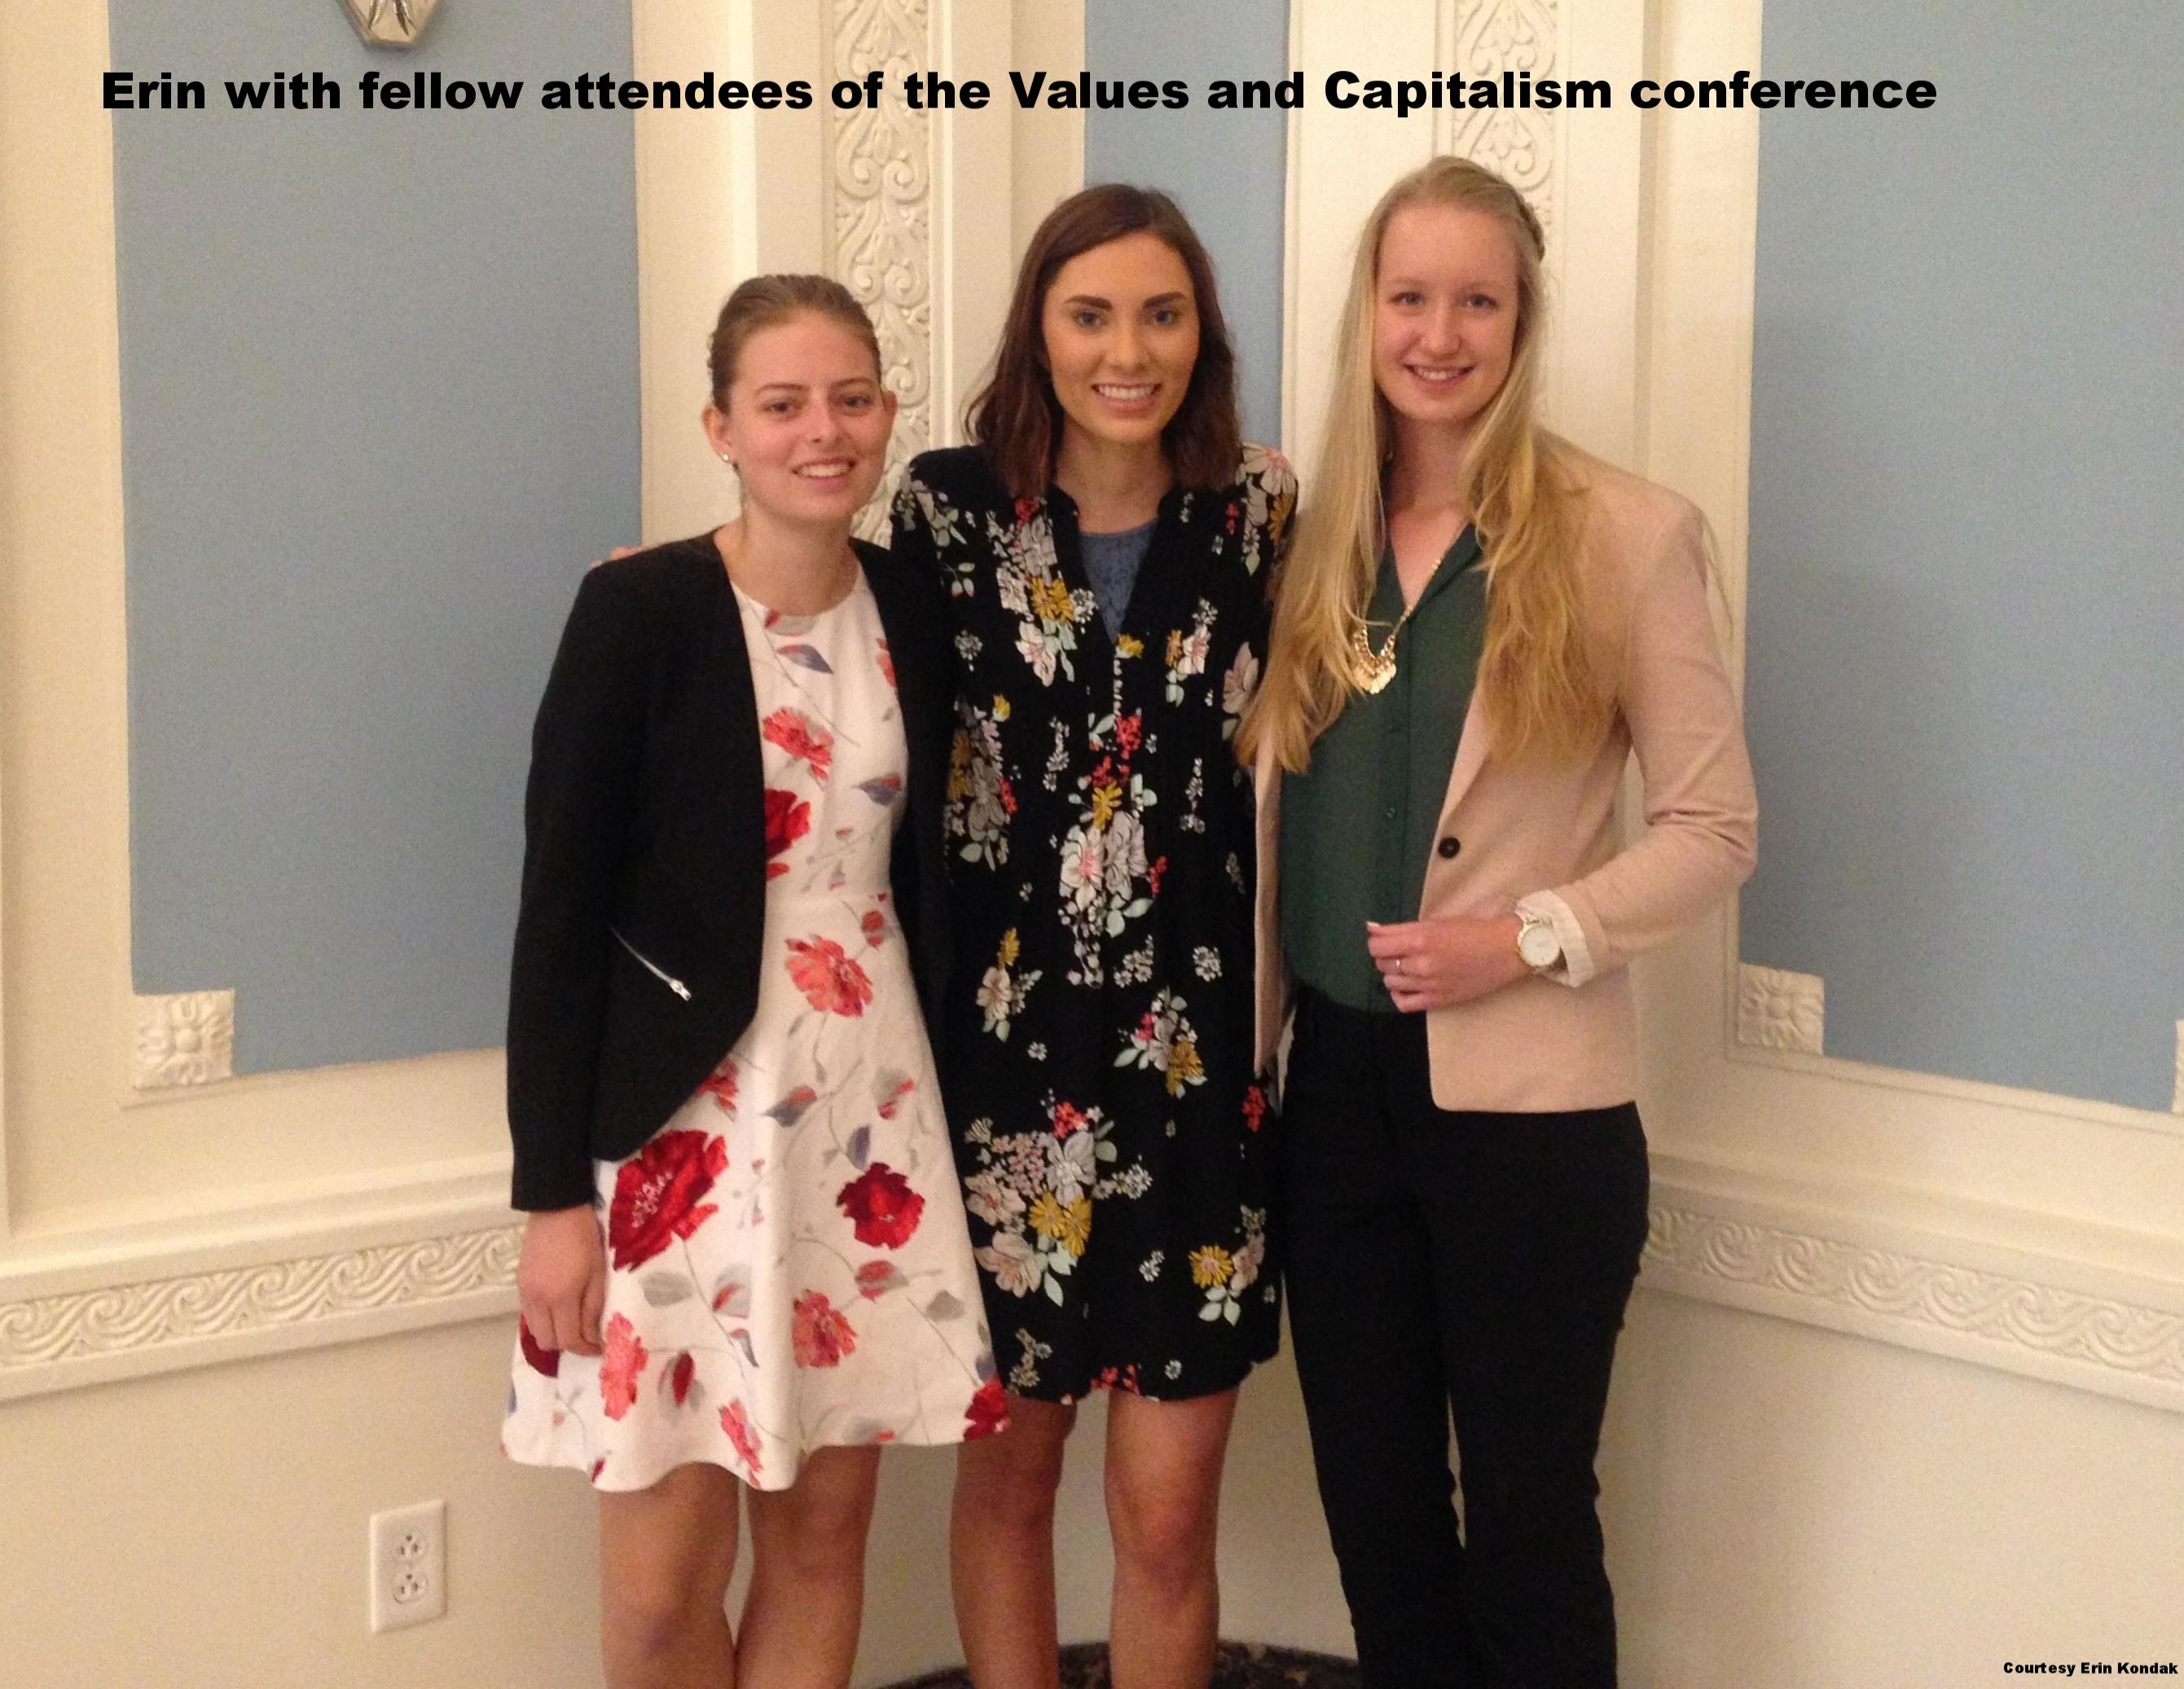 Erin Kondak at a conference